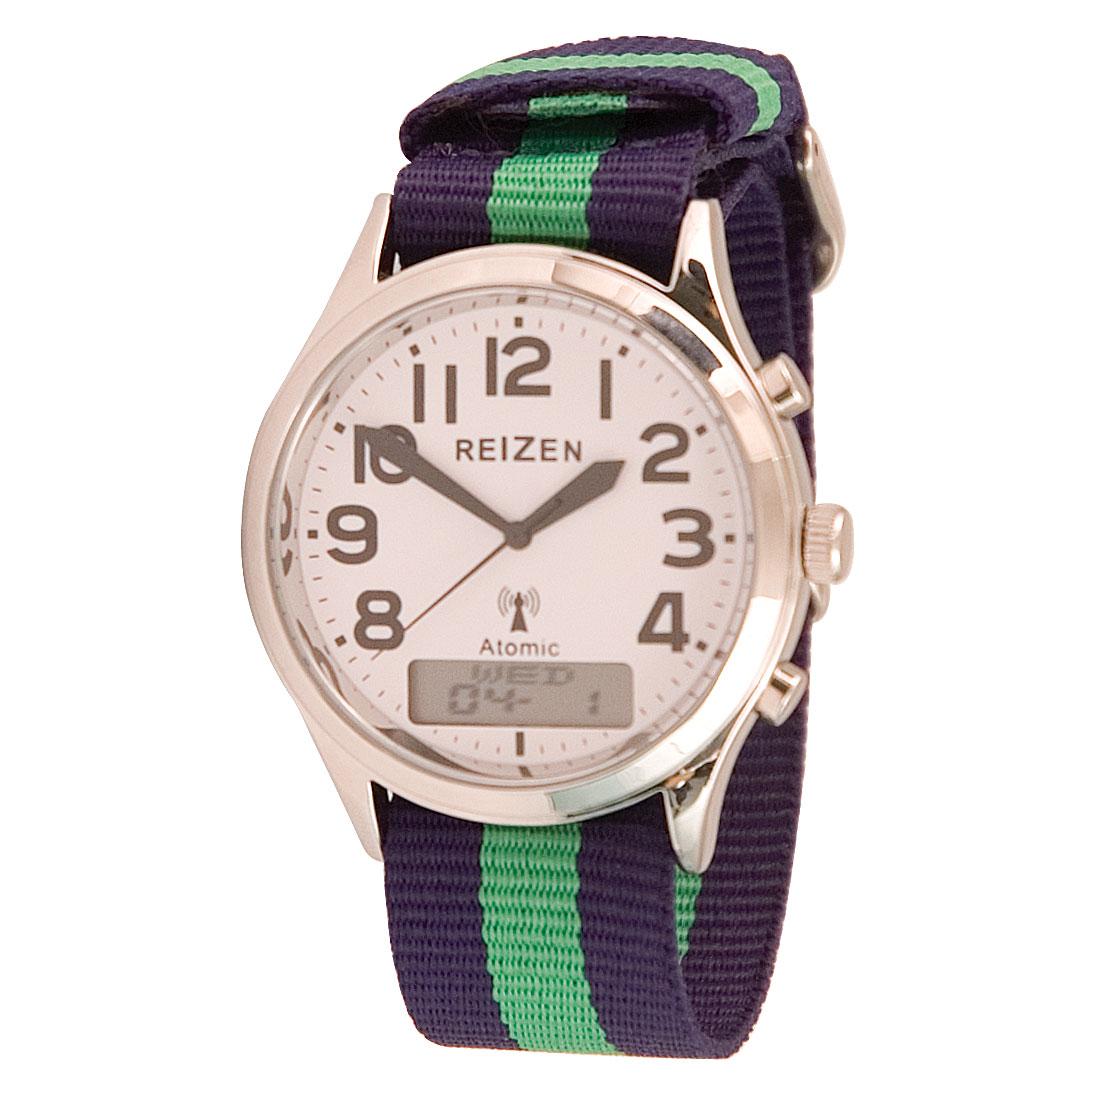 Reizen Low-Vision Ana-Digit Atomic Watch - Green-Blue Striped Band